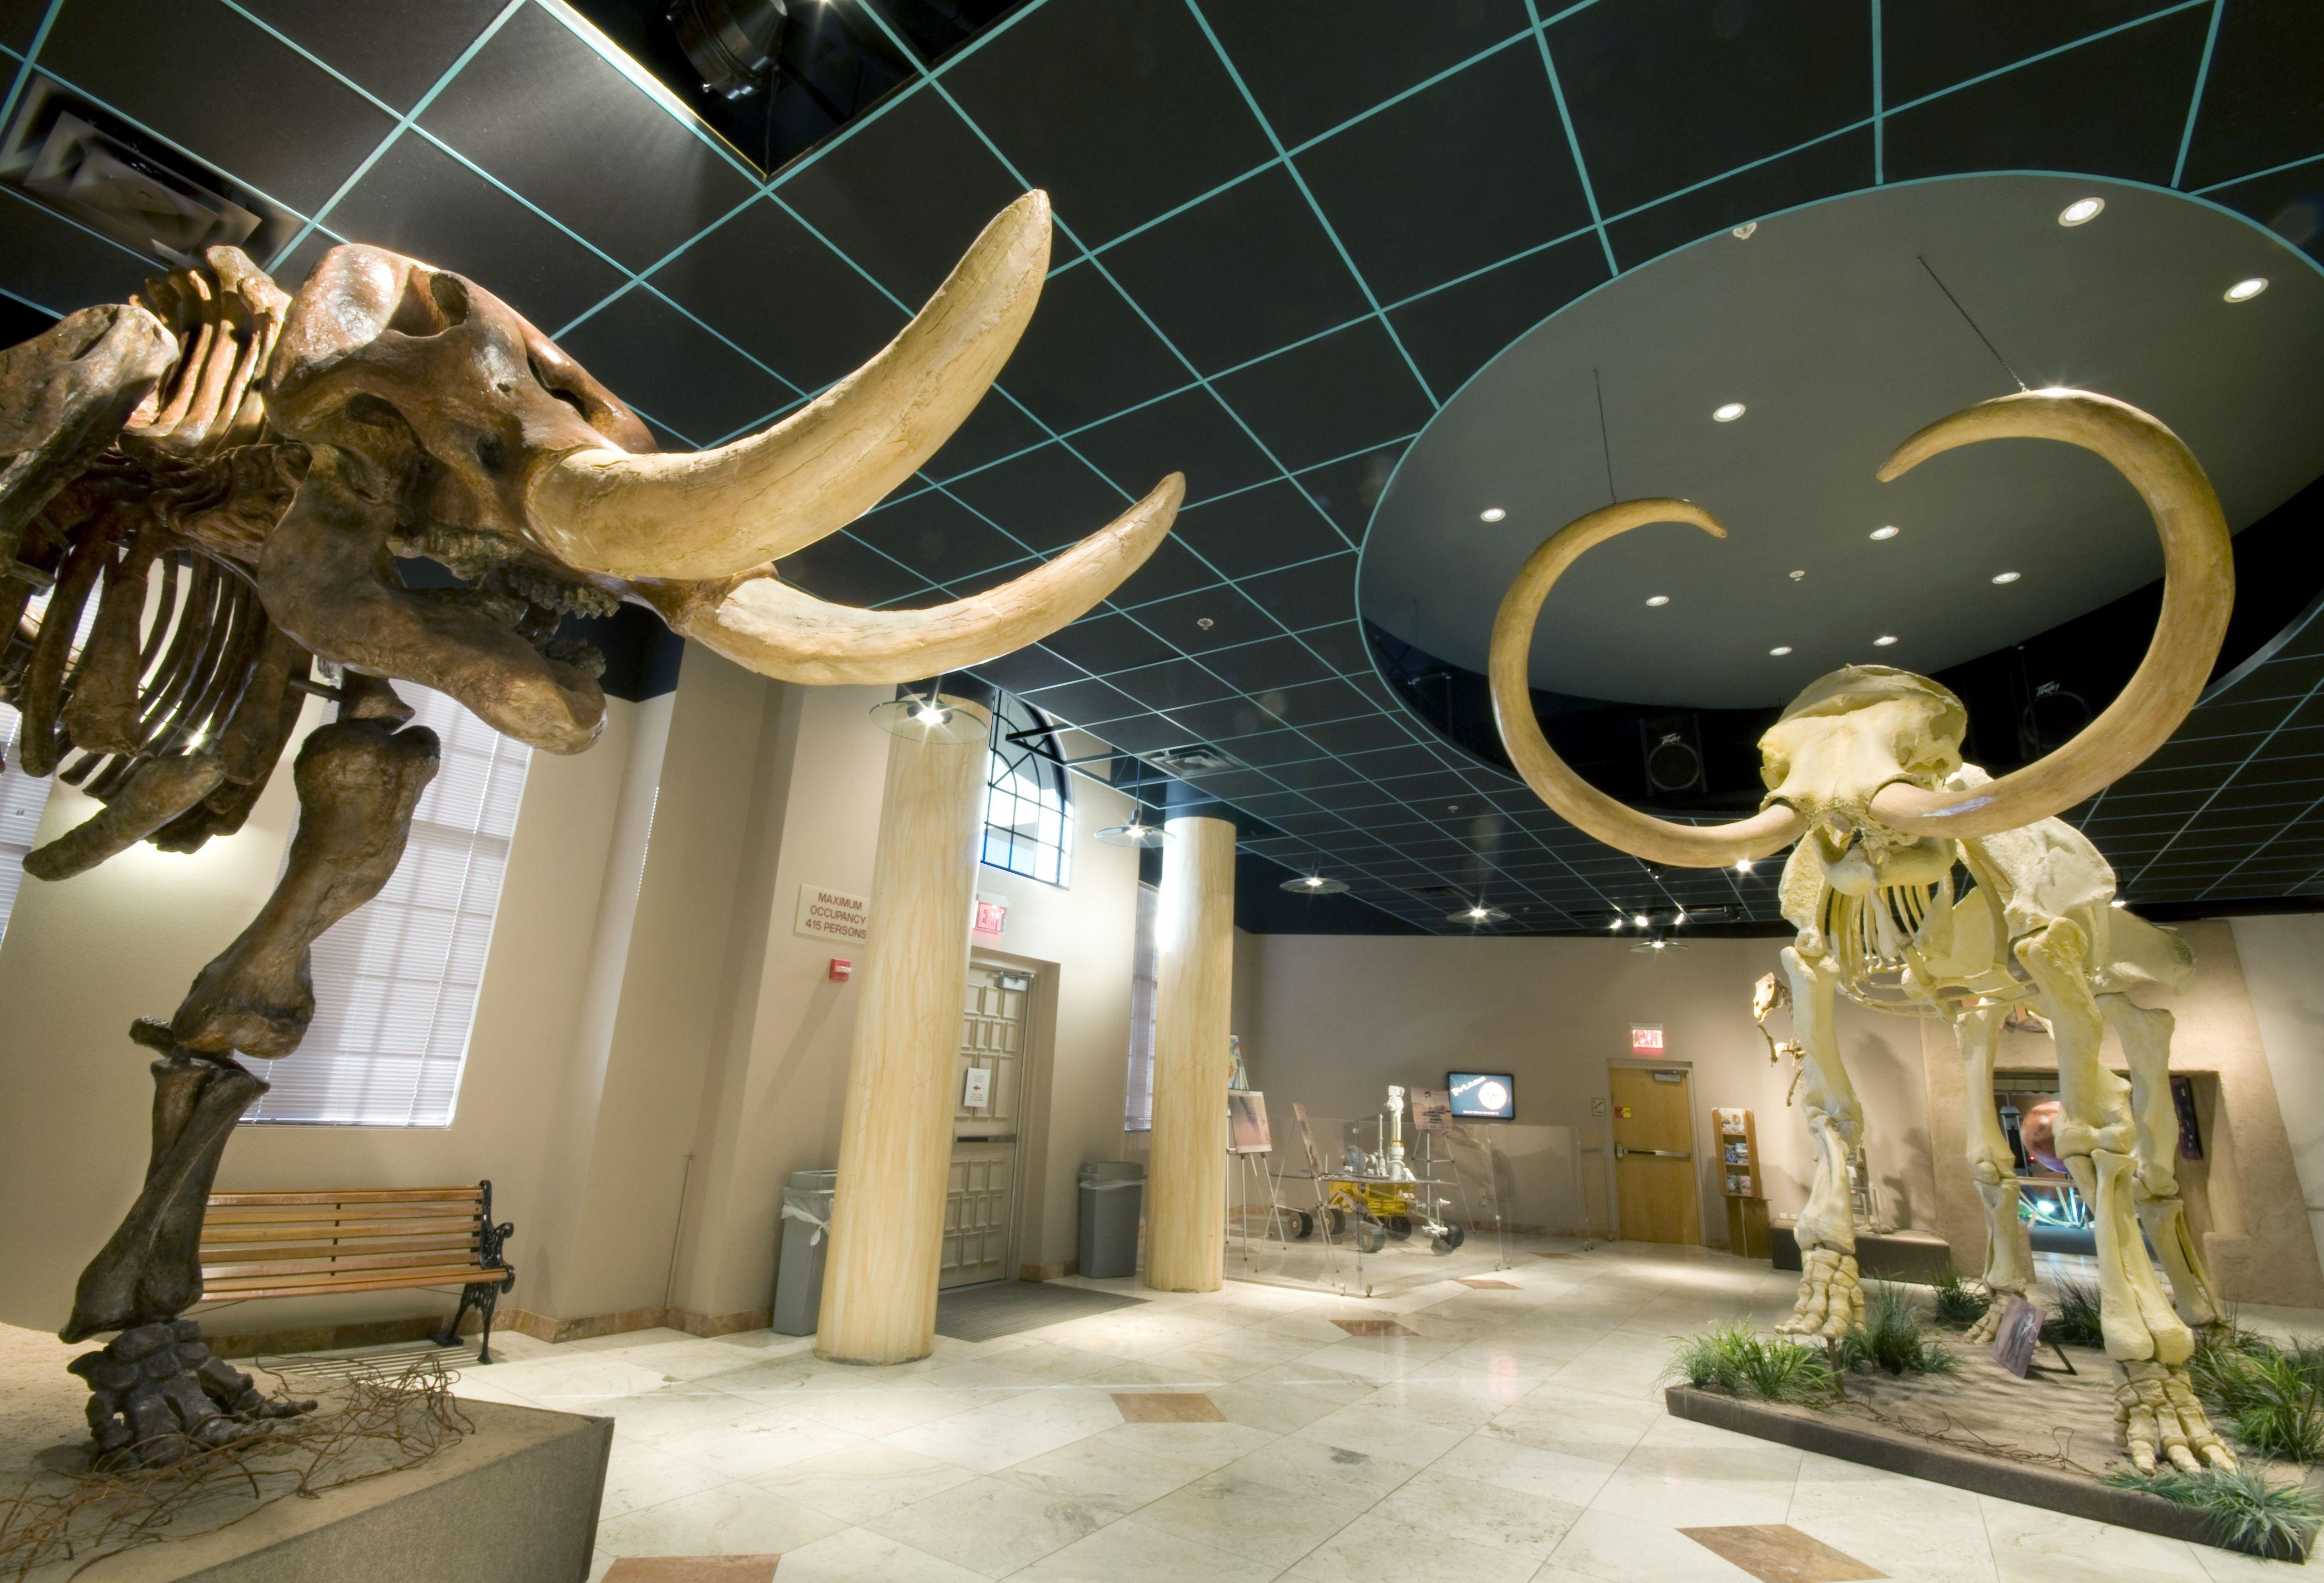 The Arizona Museum of Natural History